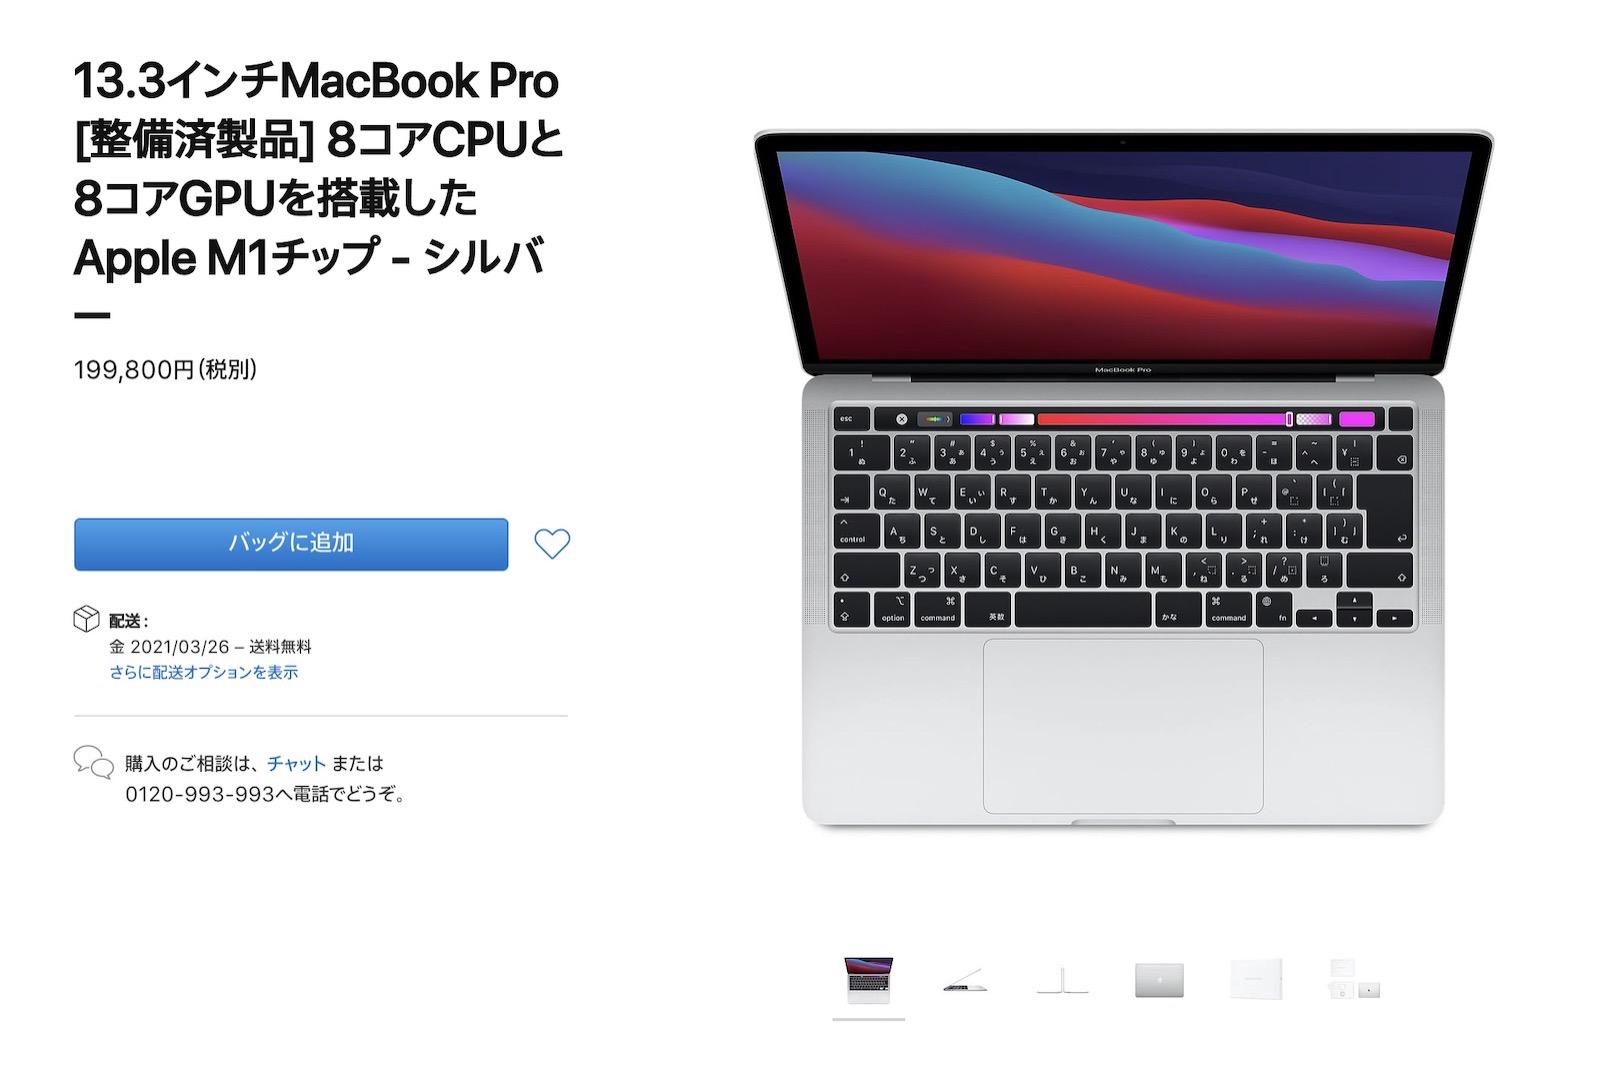 M1 macbook pro 2tb model